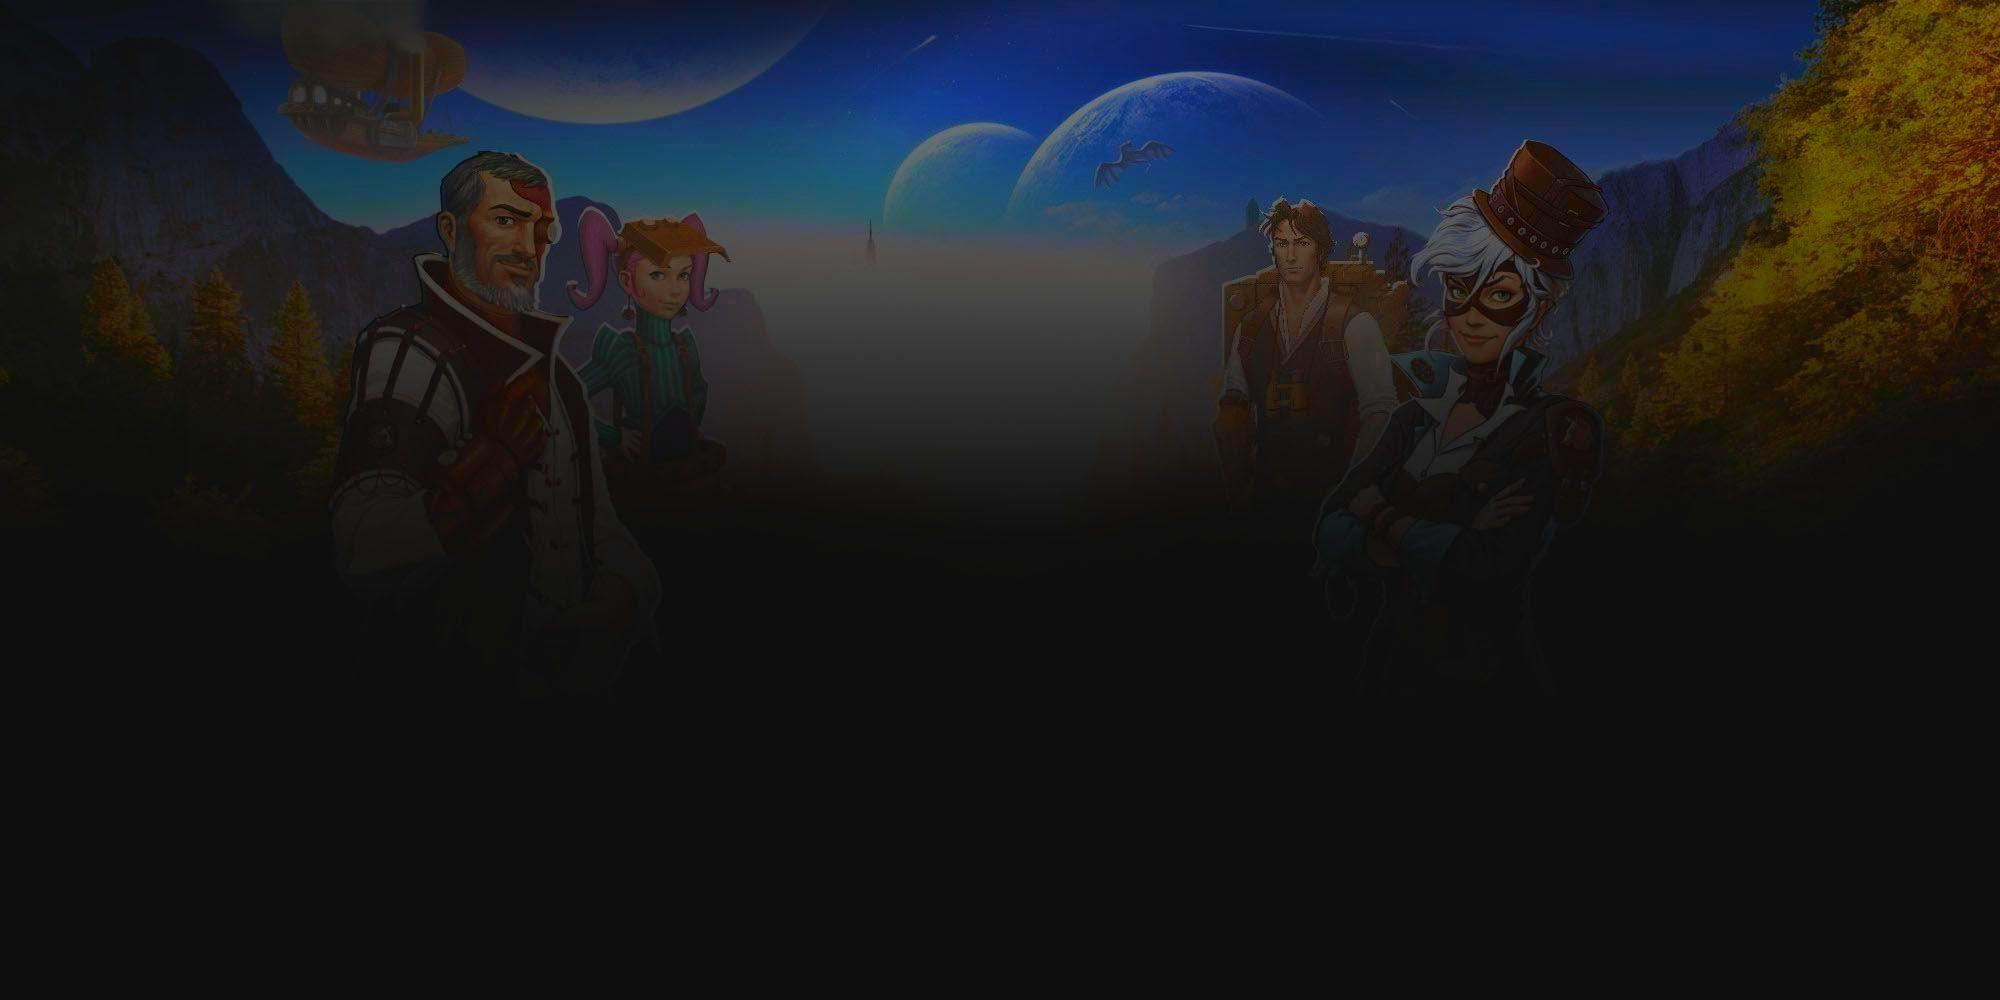 Voyage to Fantasy: Part 1